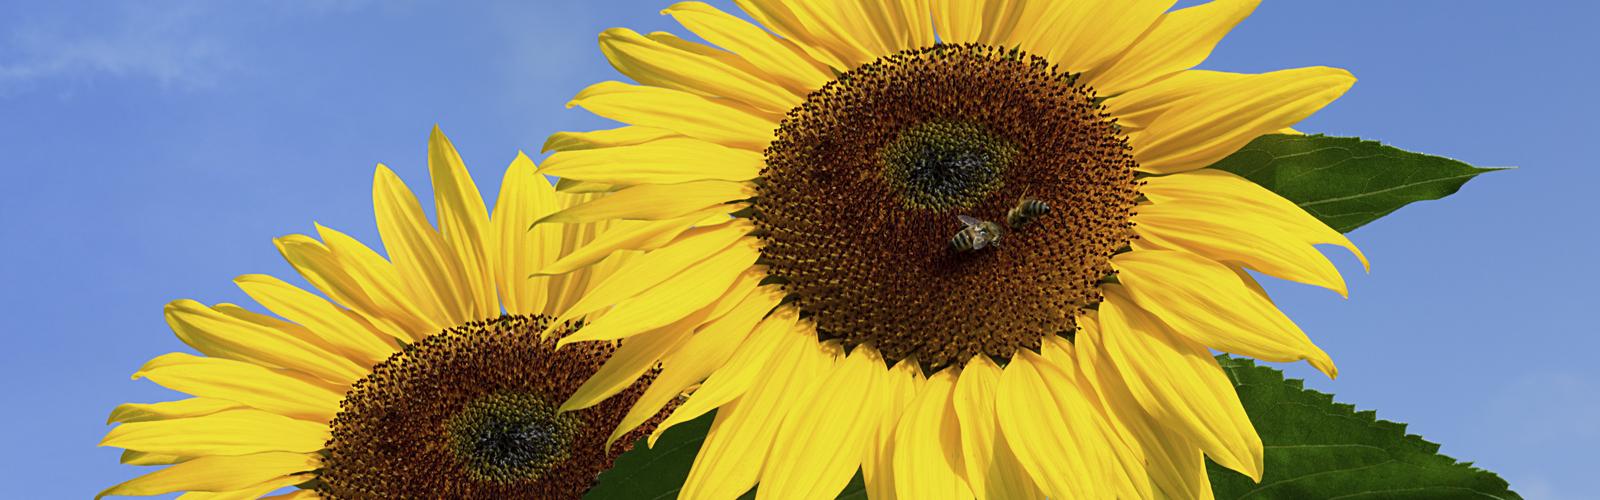 home-sonnenblumen